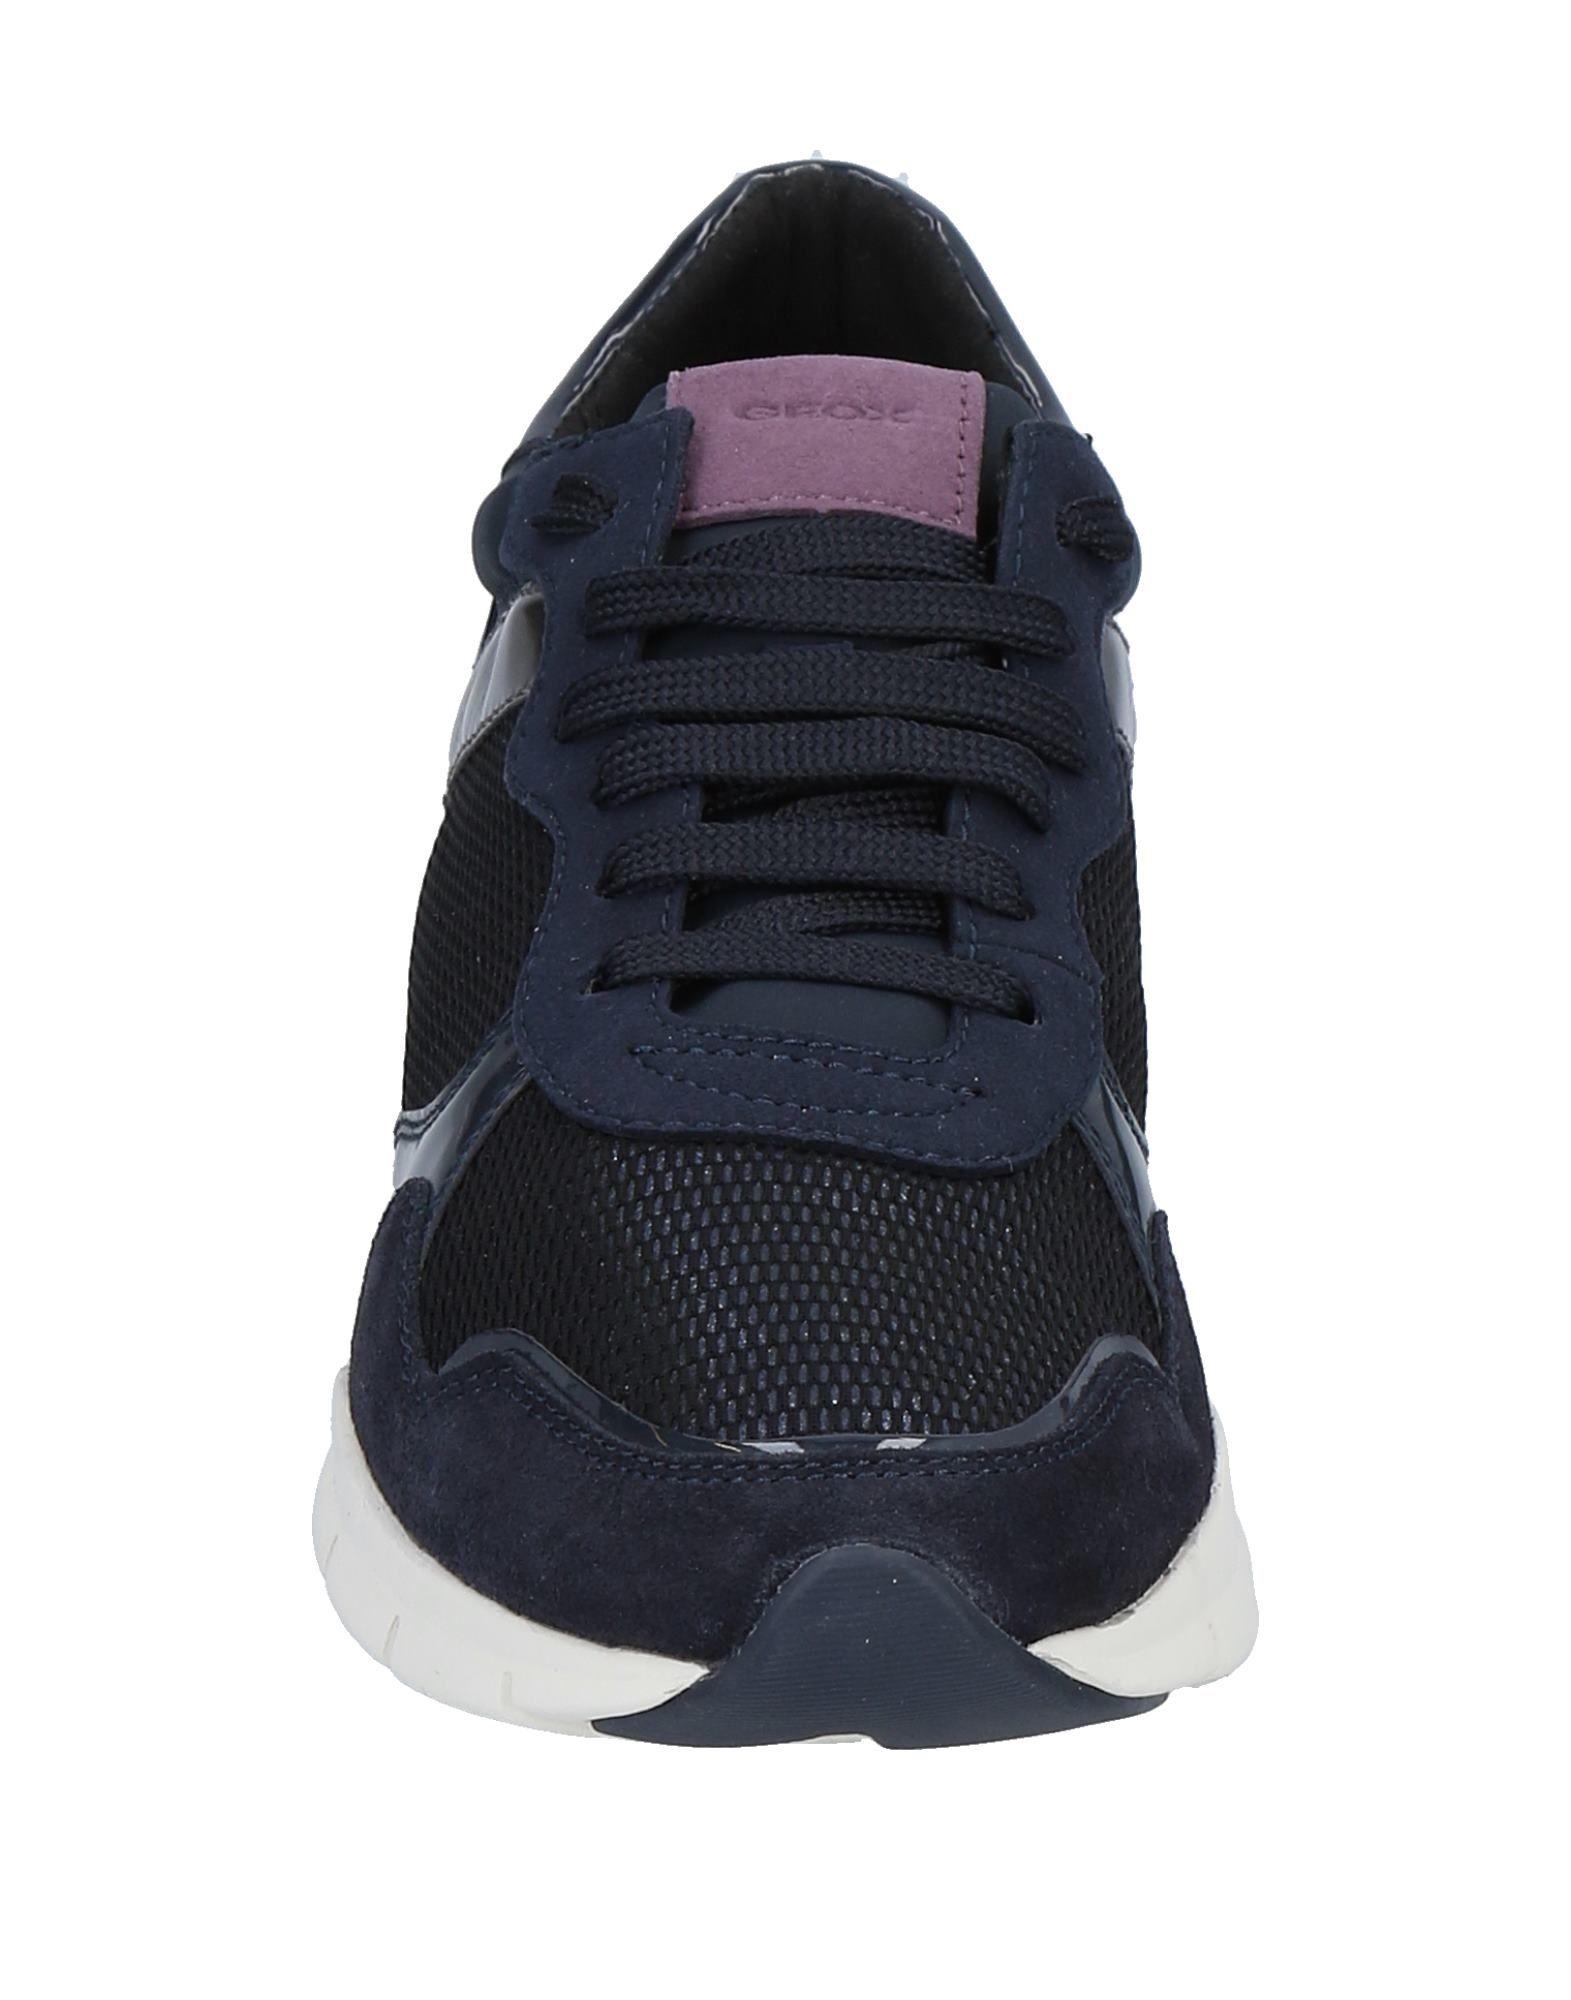 Geox Sneakers Damen   Damen 11541772PK Heiße Schuhe d15f6d